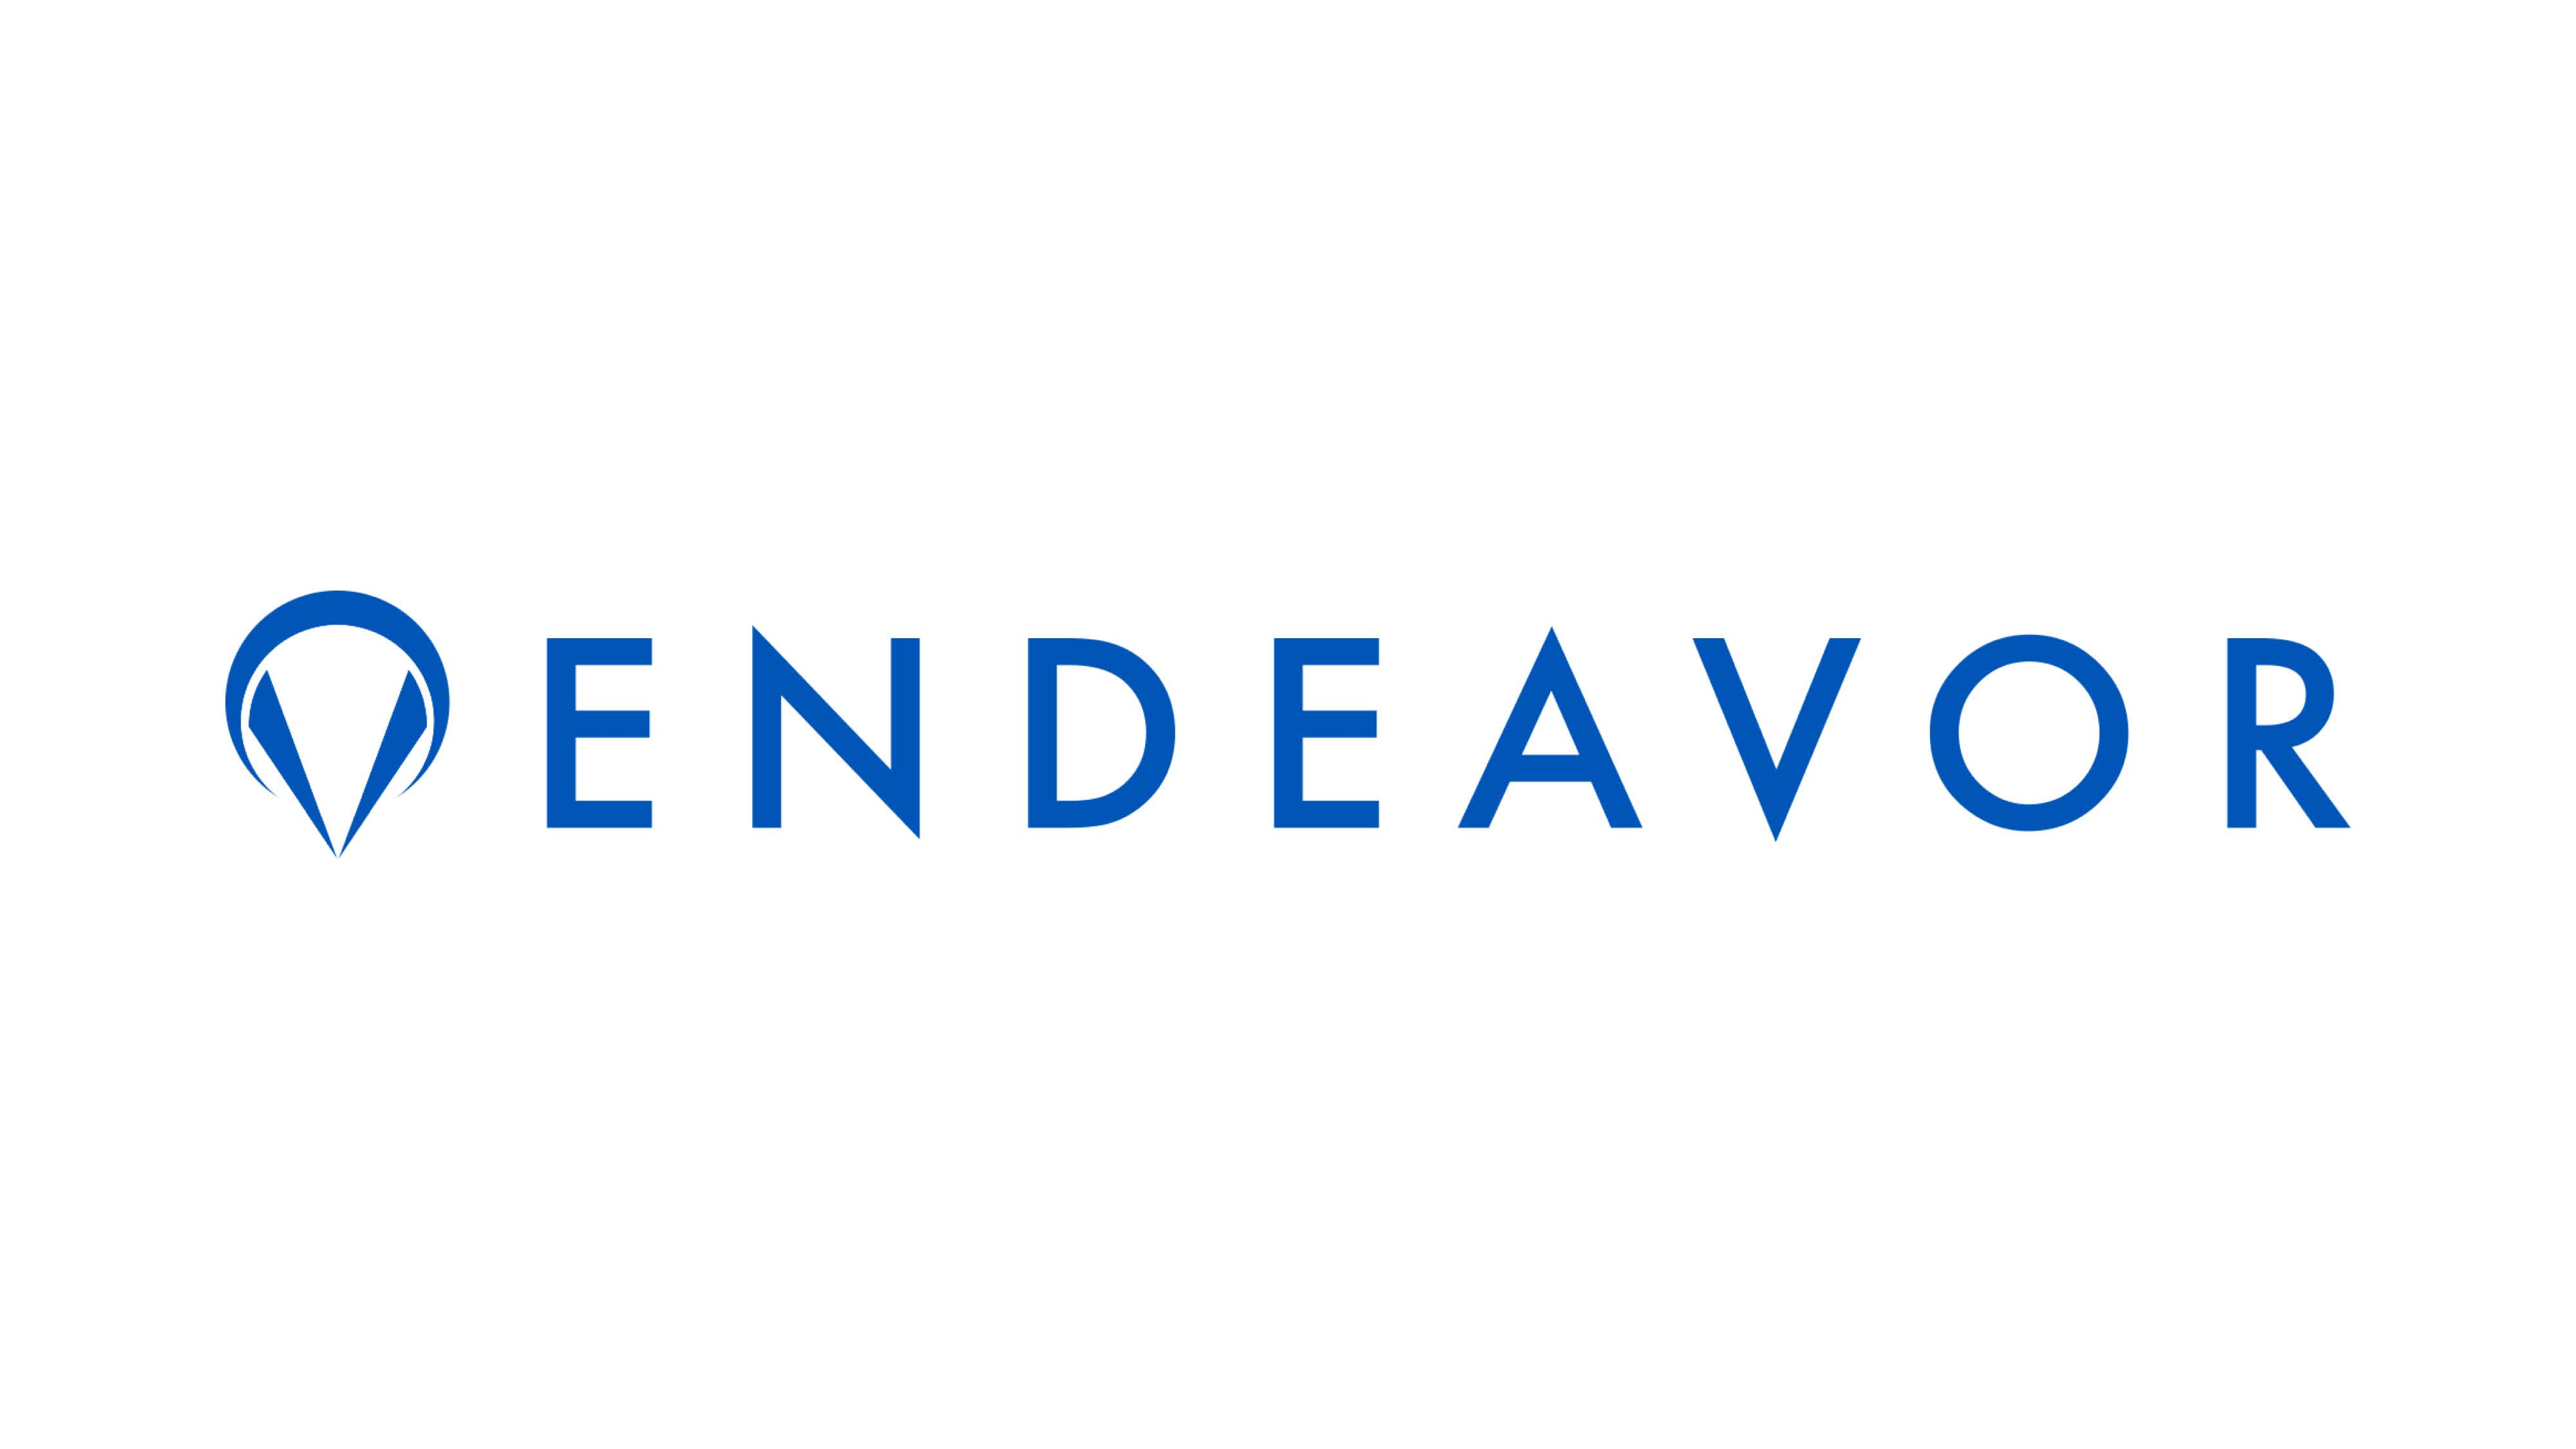 endeavor_19.jpg